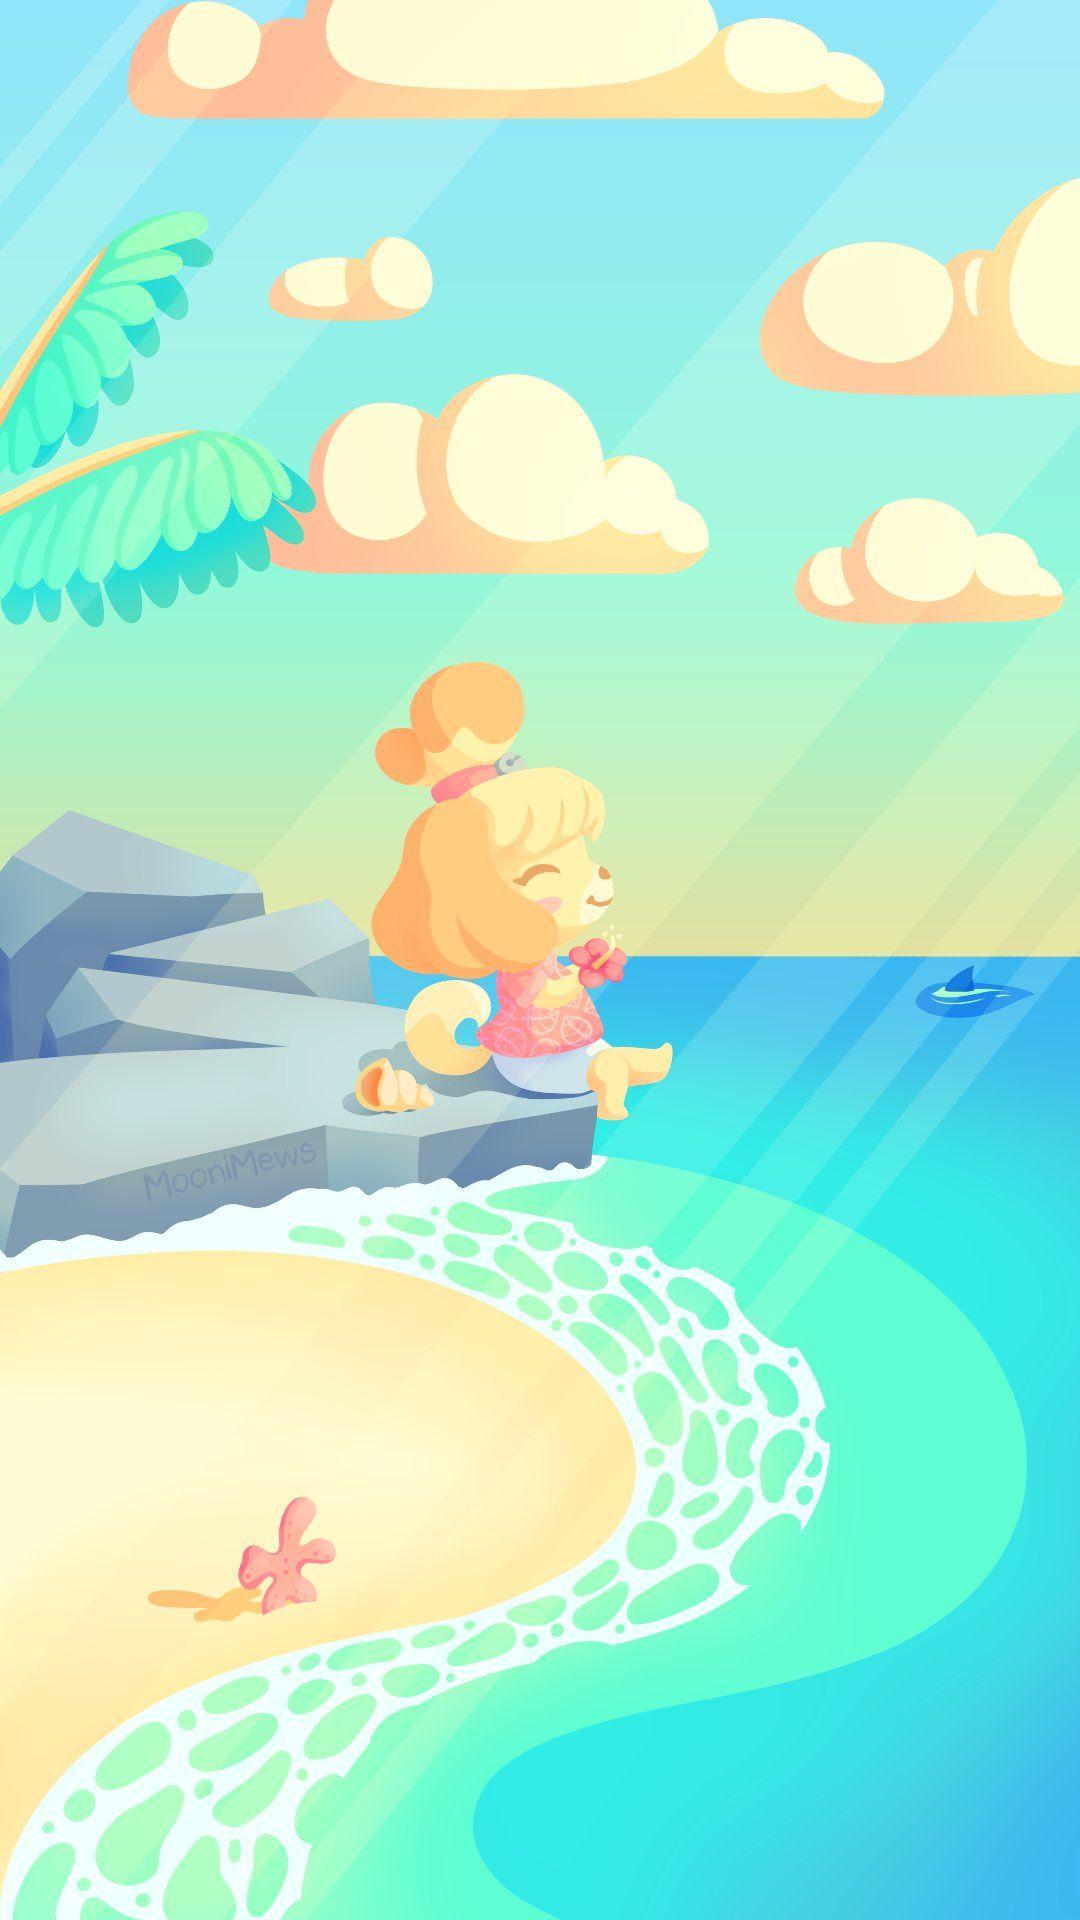 Moonimews Bim On Twitter Animal Crossing Fan Art Animal Crossing Wallpaper Animal Crossing Villagers